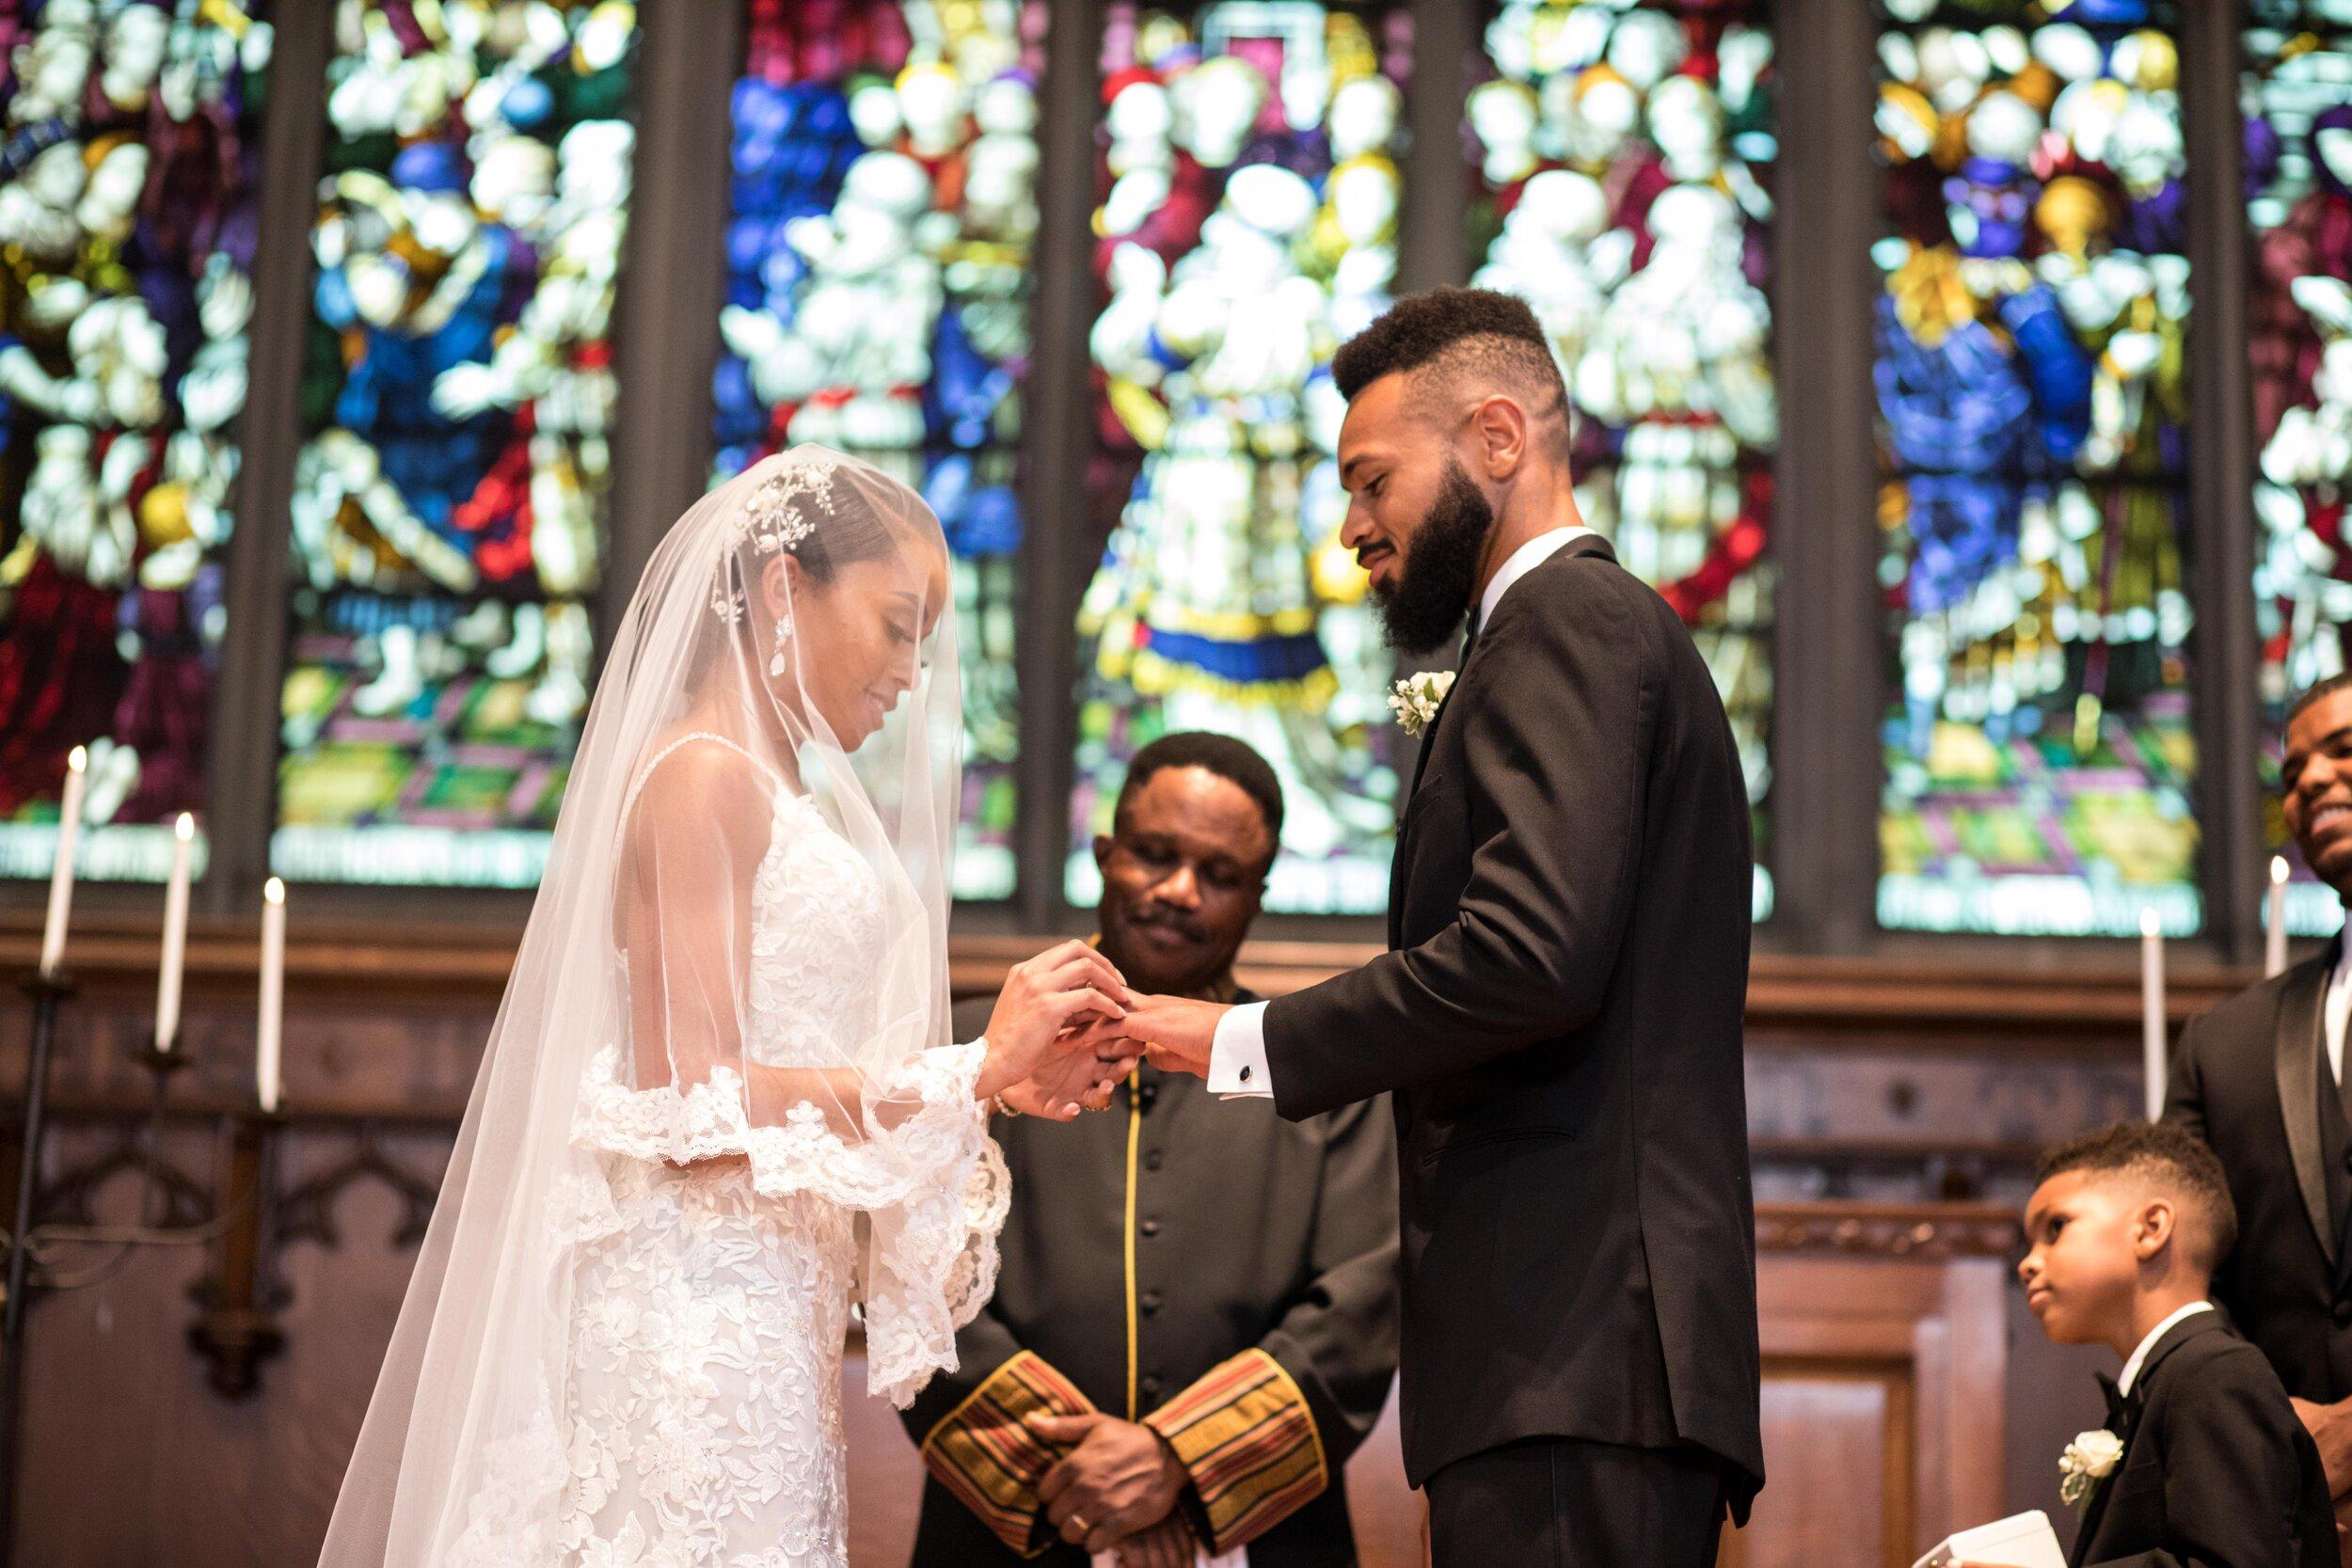 8_3_2019_BONTY_WEDDING-367.jpg